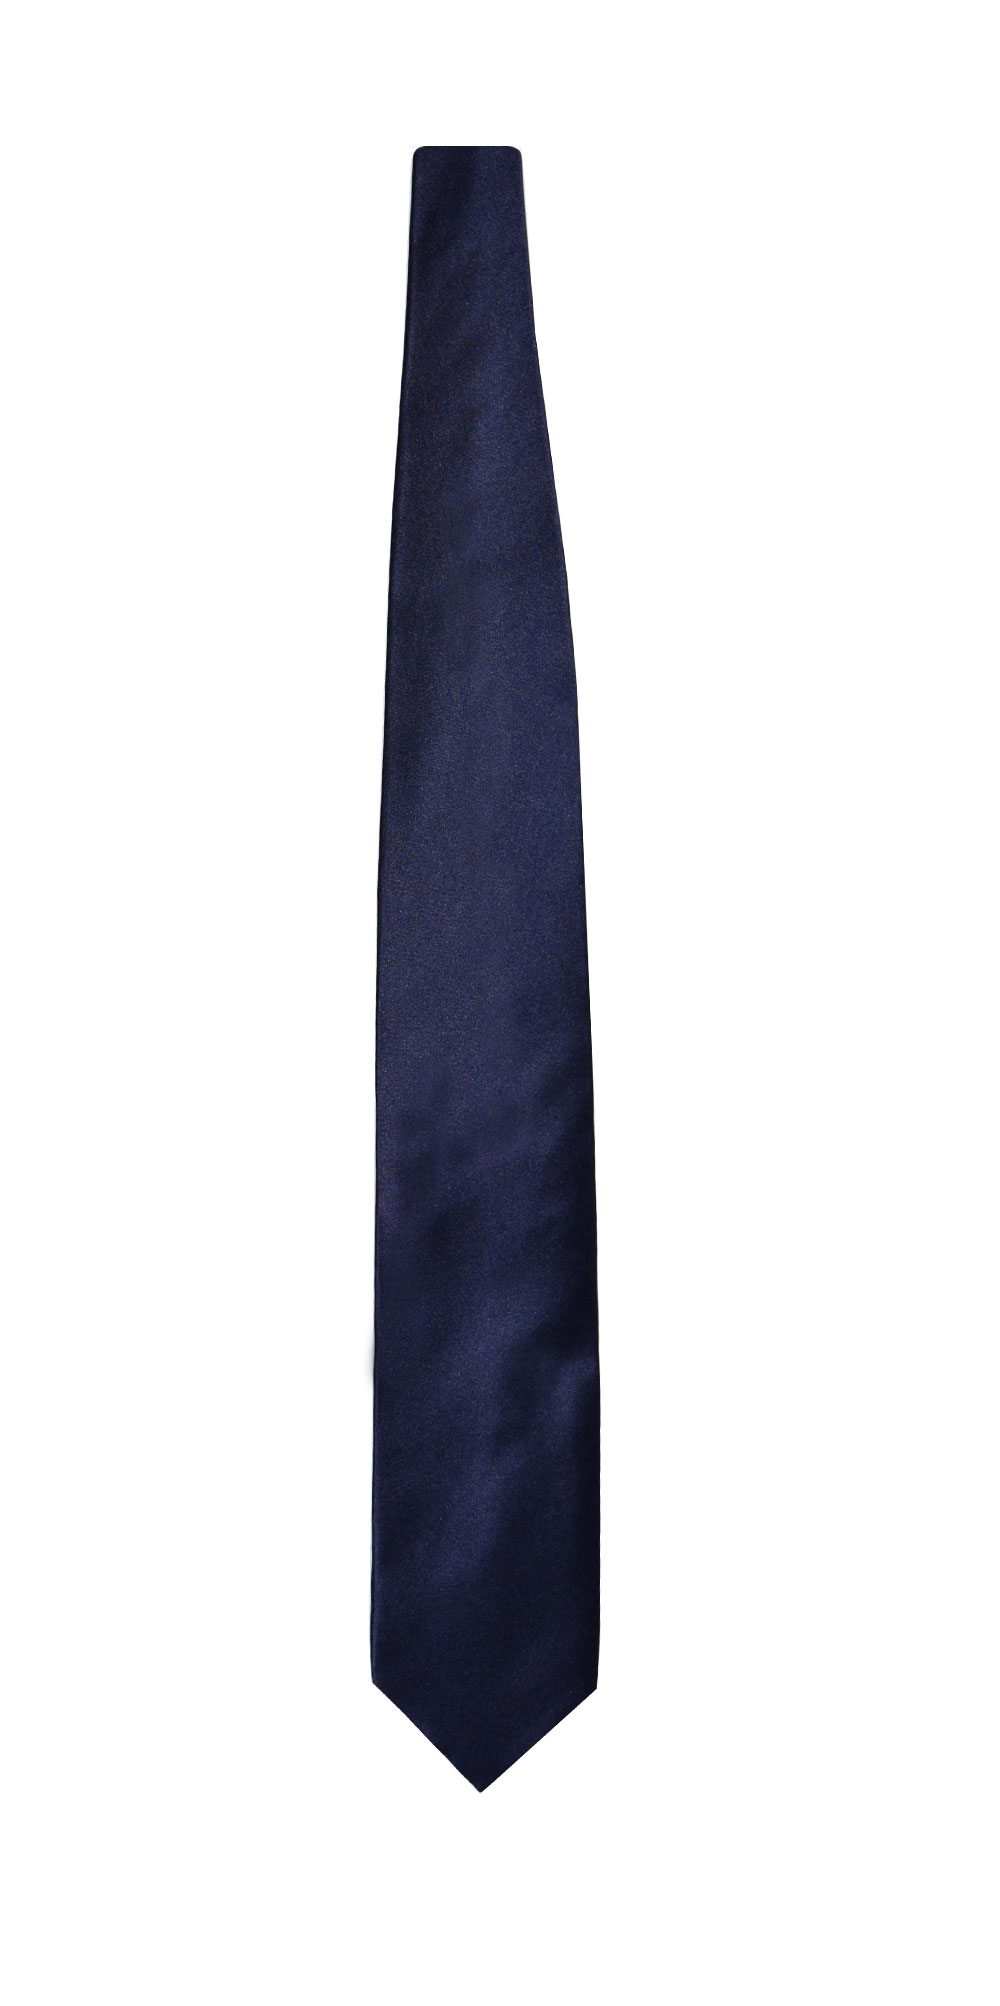 Wear this tie anywhere black tie is worn